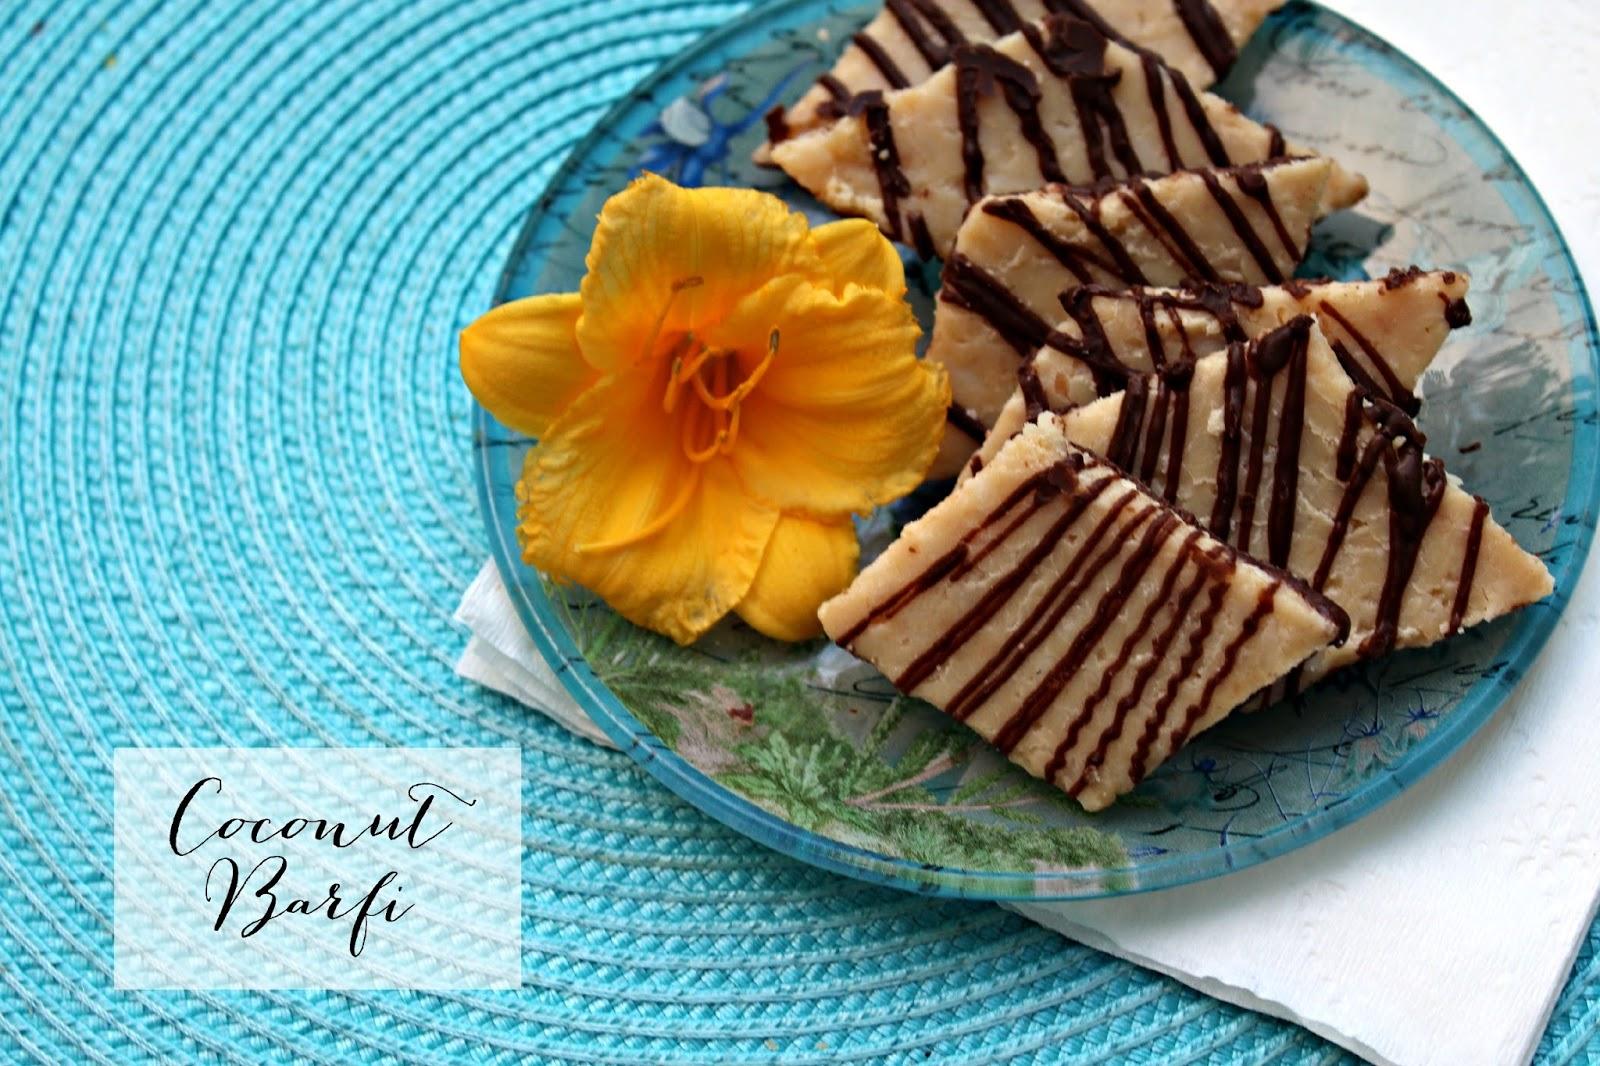 Coconut Barfi (Indian Sweet) | Best of Wardah